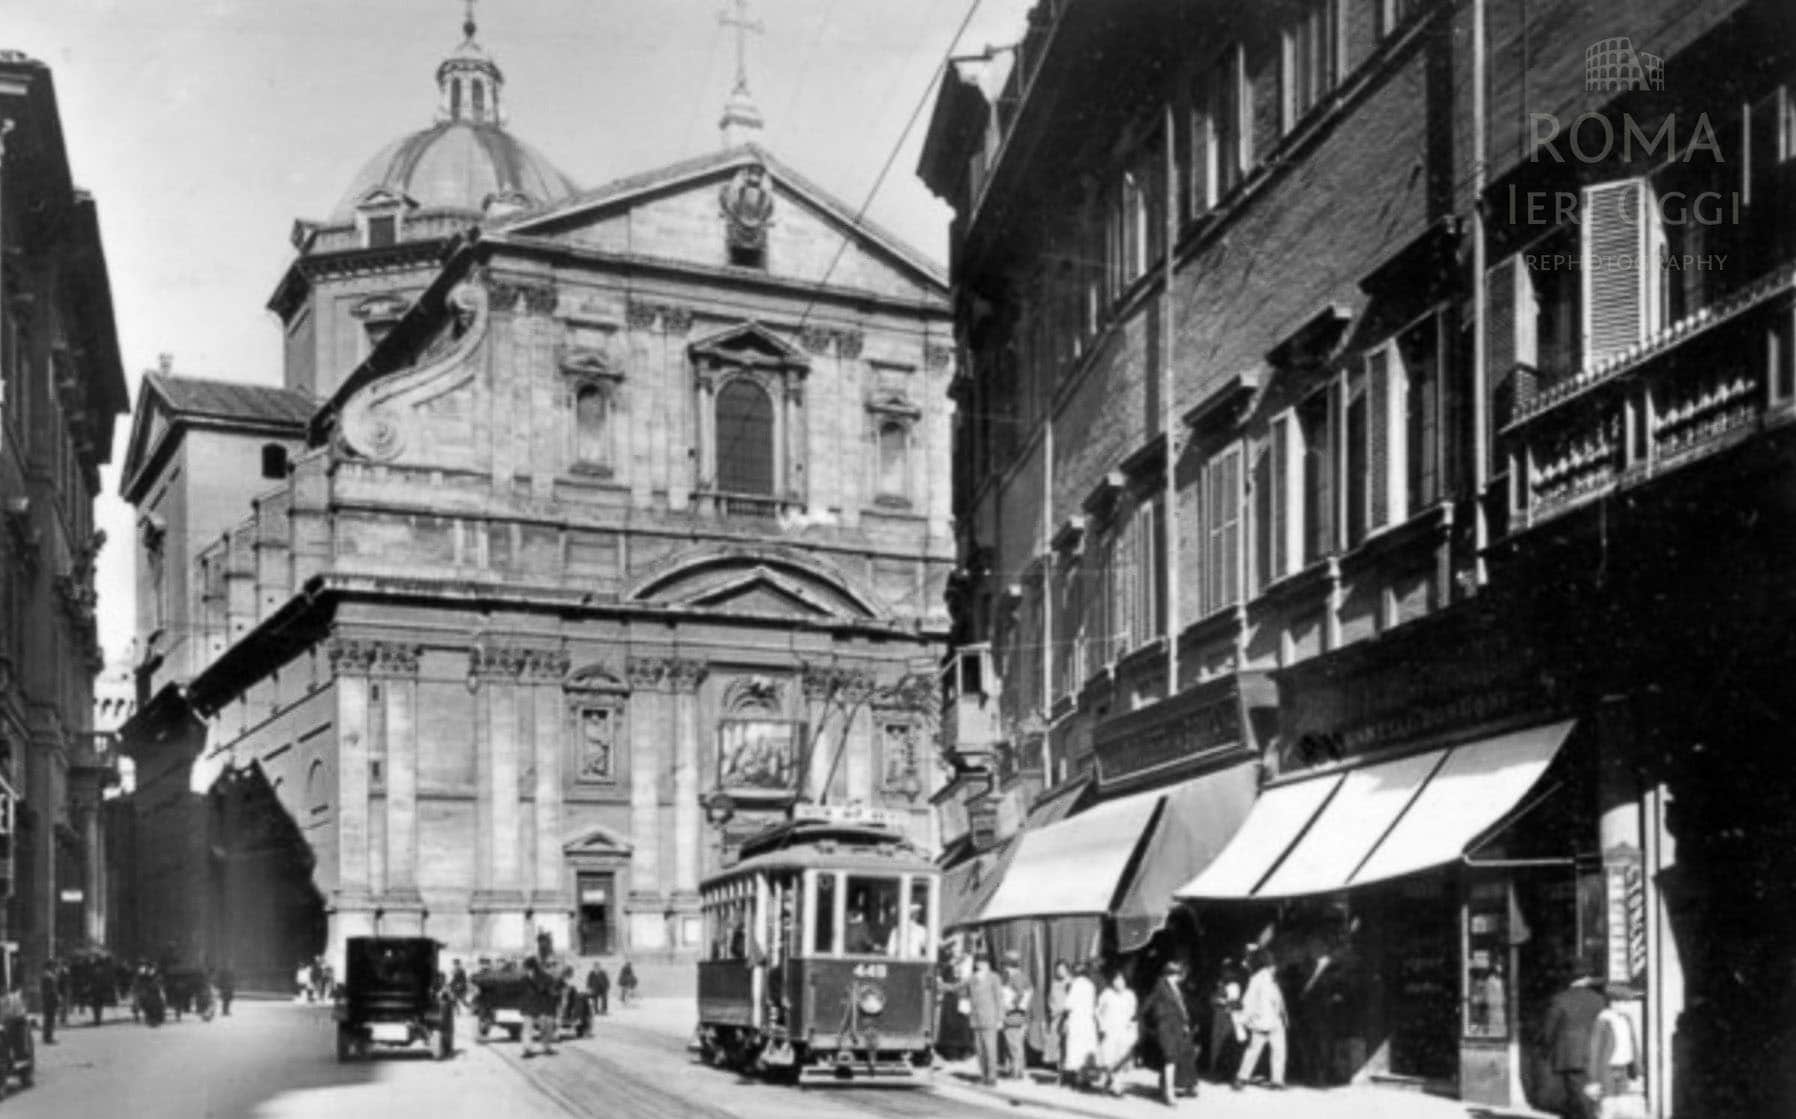 Corso Vittorio Emanuele II - Chiesa del gesù